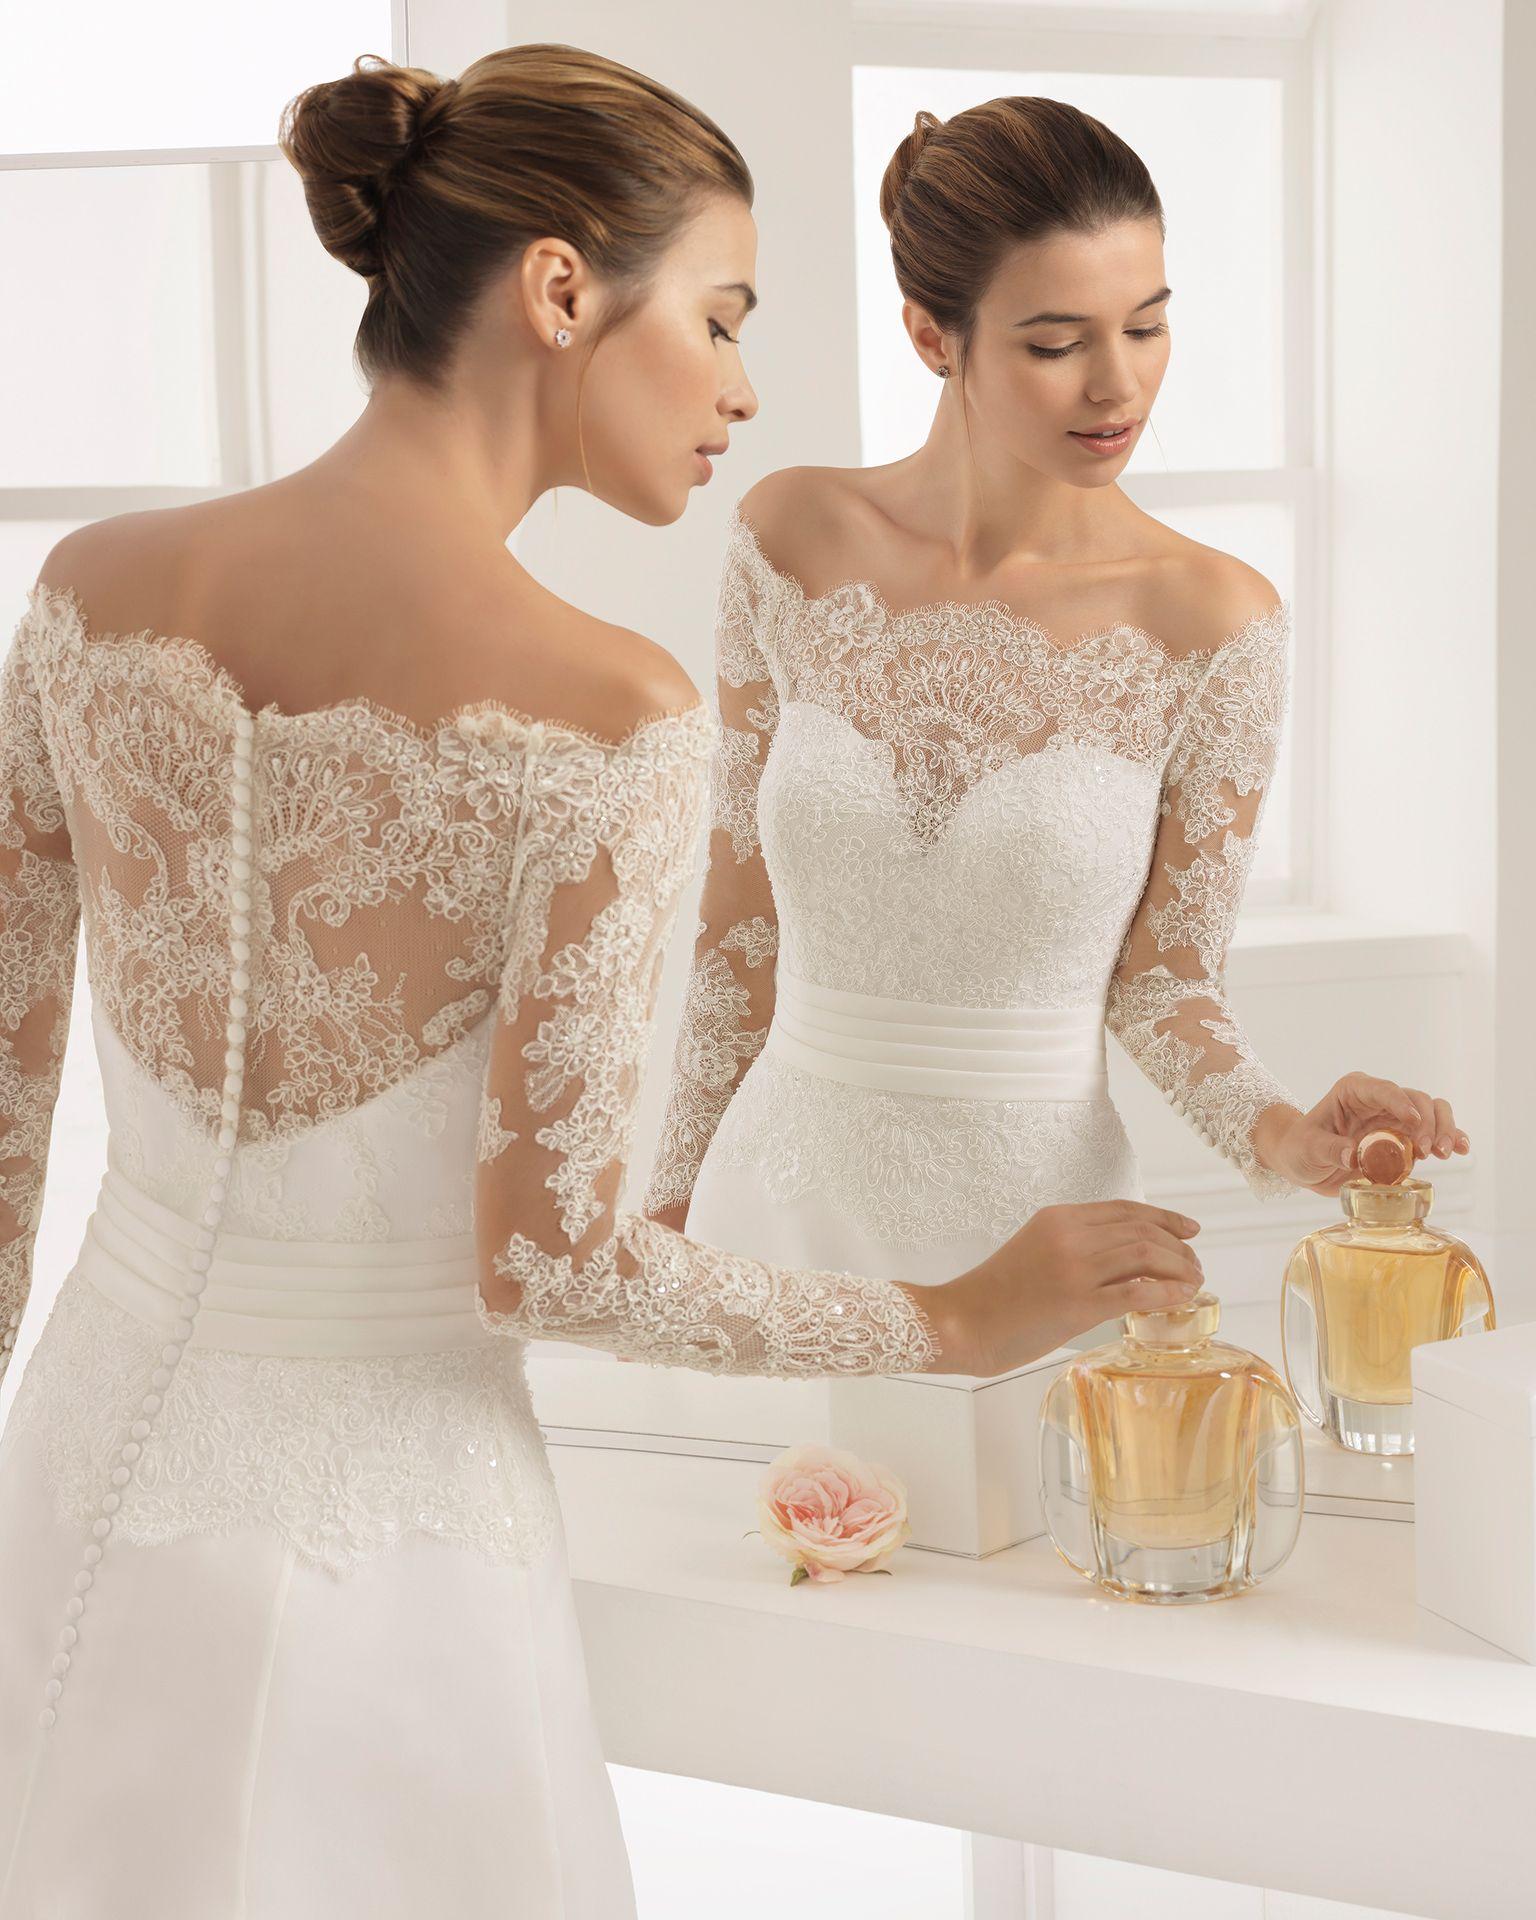 2018_BILMA_AIRE_BARCELONA_3.jpg (1536×1920) | Wedding dress2 | Pinterest